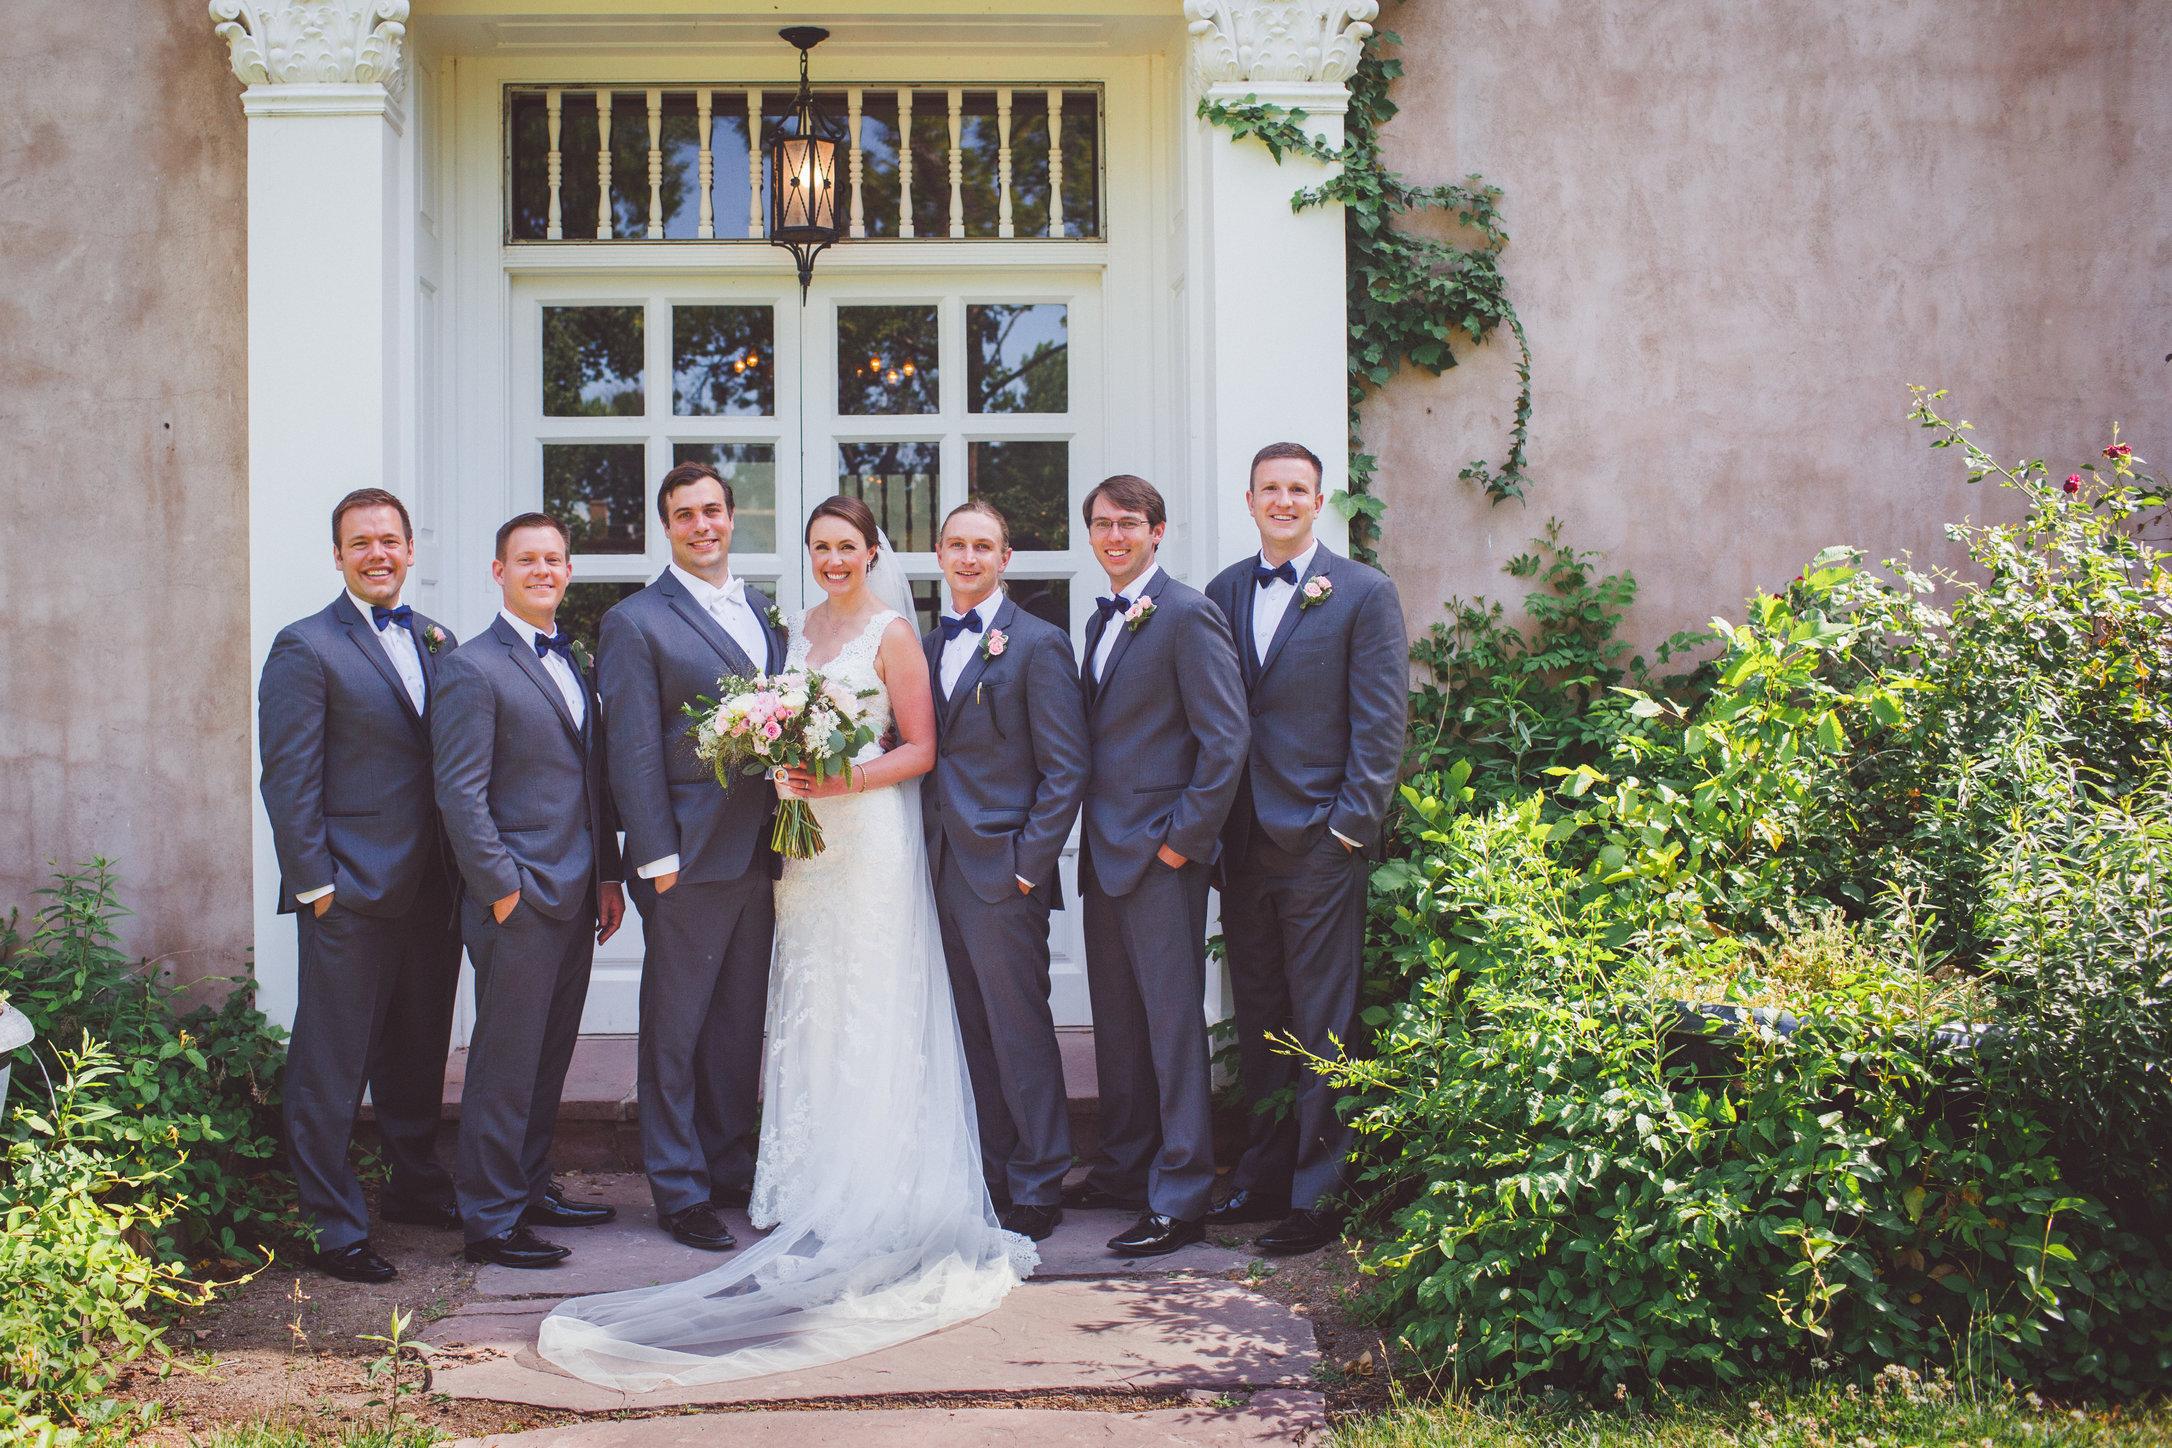 SandC-wedding-349.jpg